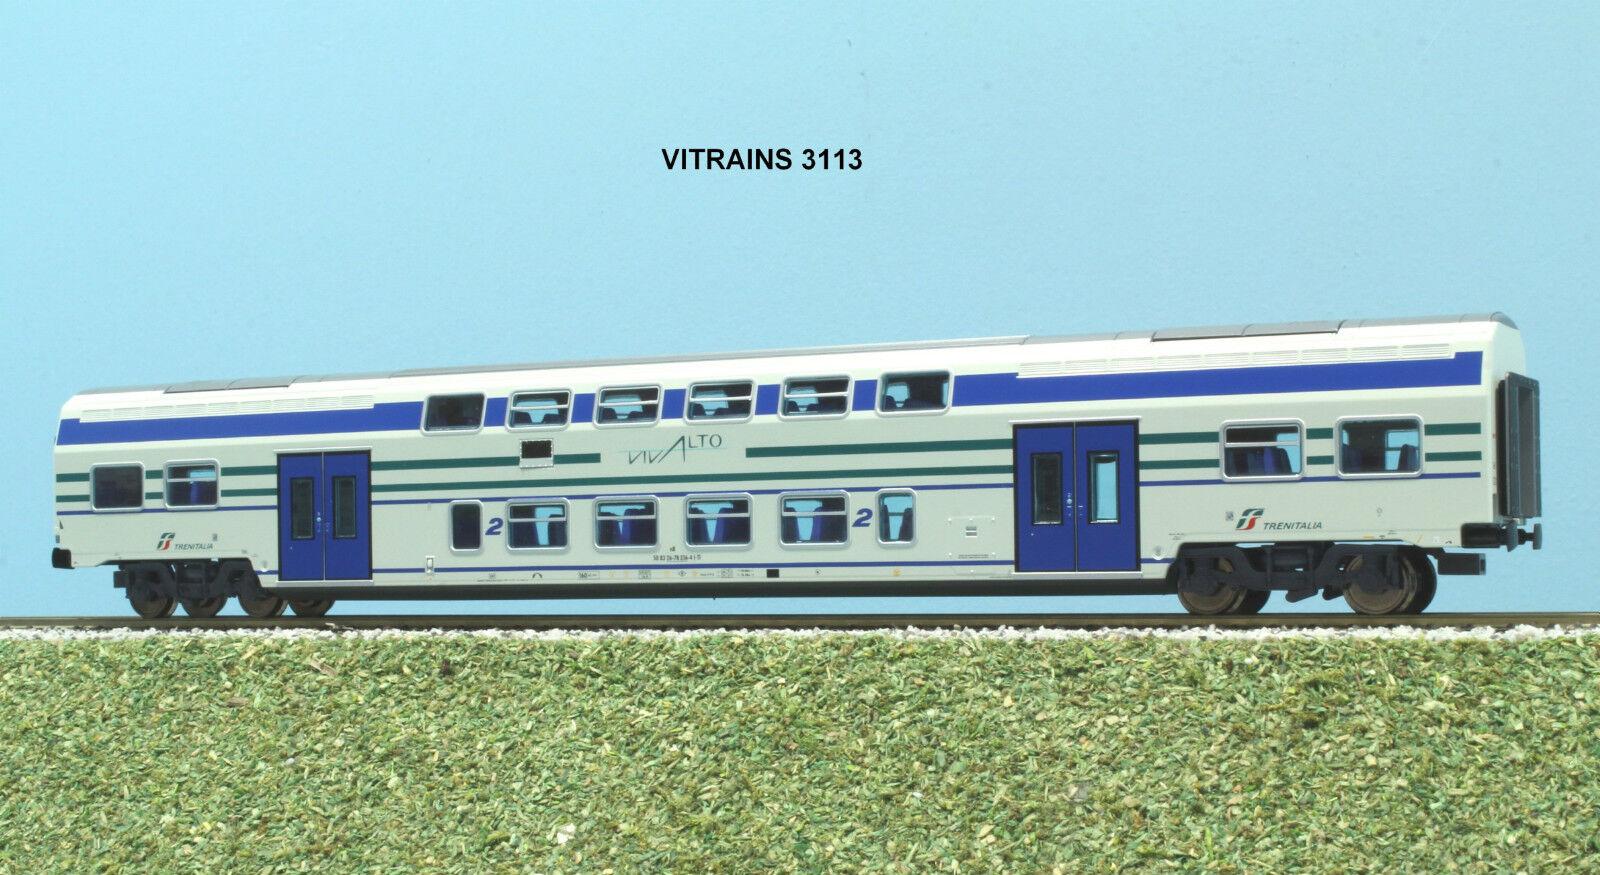 Vitrains ART. 3113 carrozza VIVALTO   di 2 classe livrea  FS Trenitalia